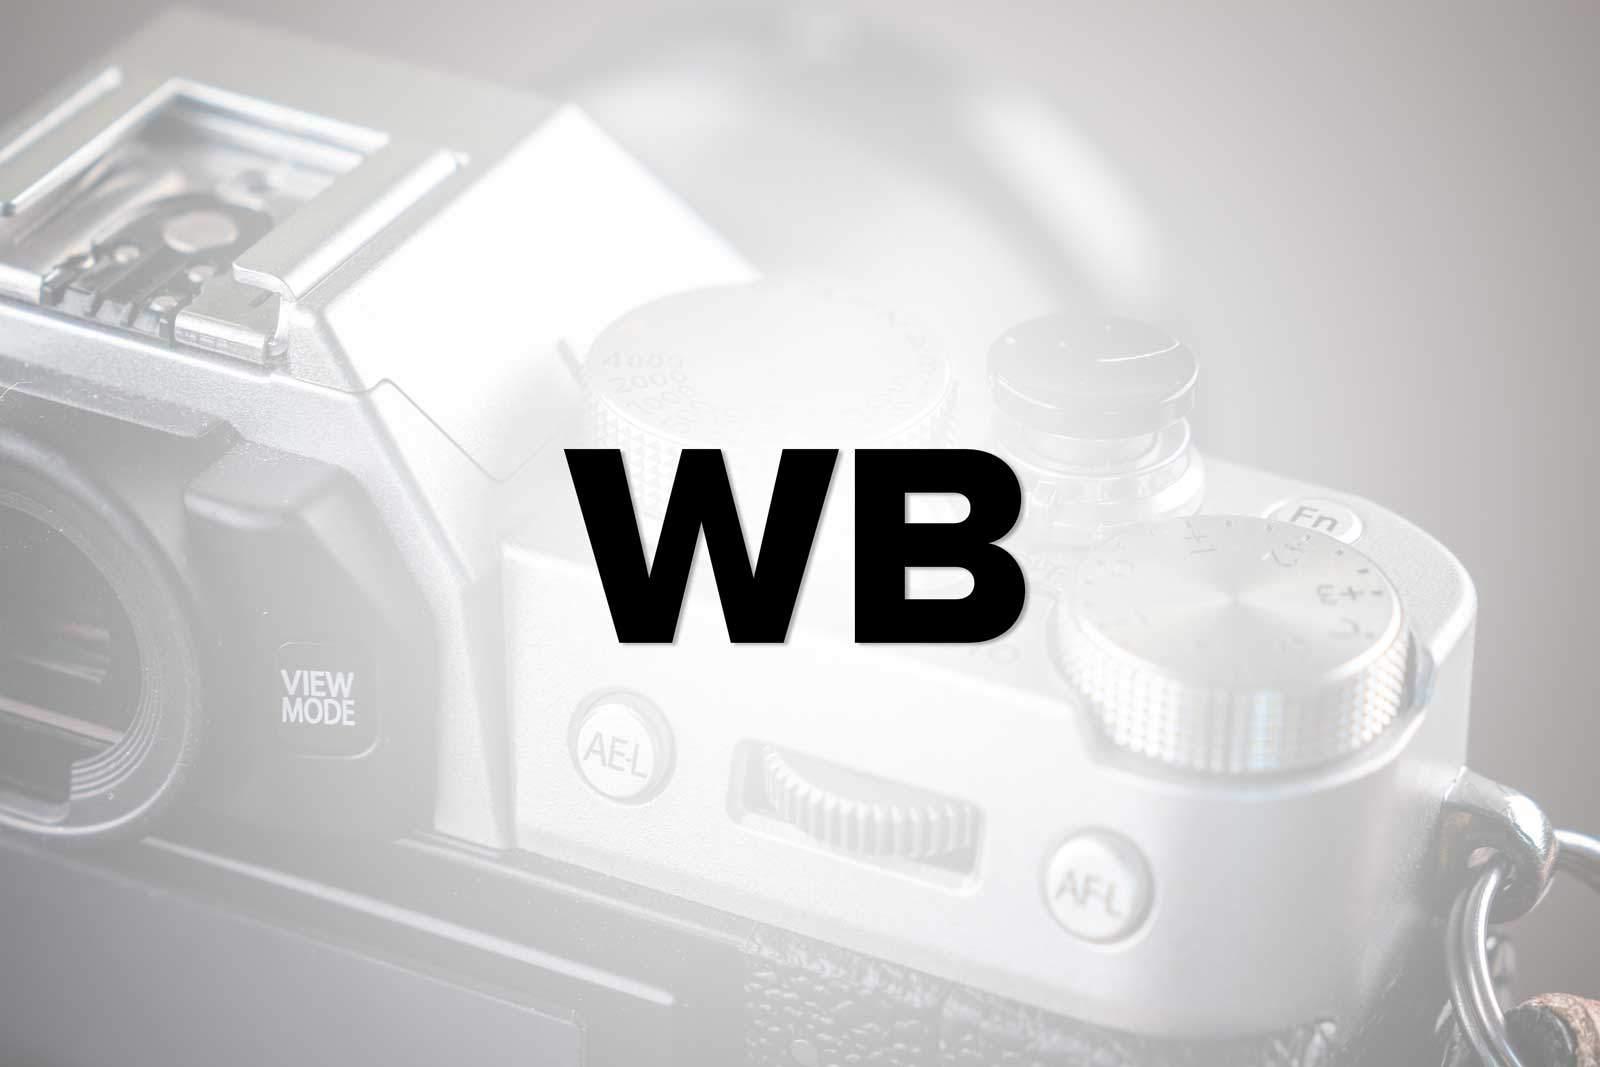 Kamera Fujifilm Weißabgleich